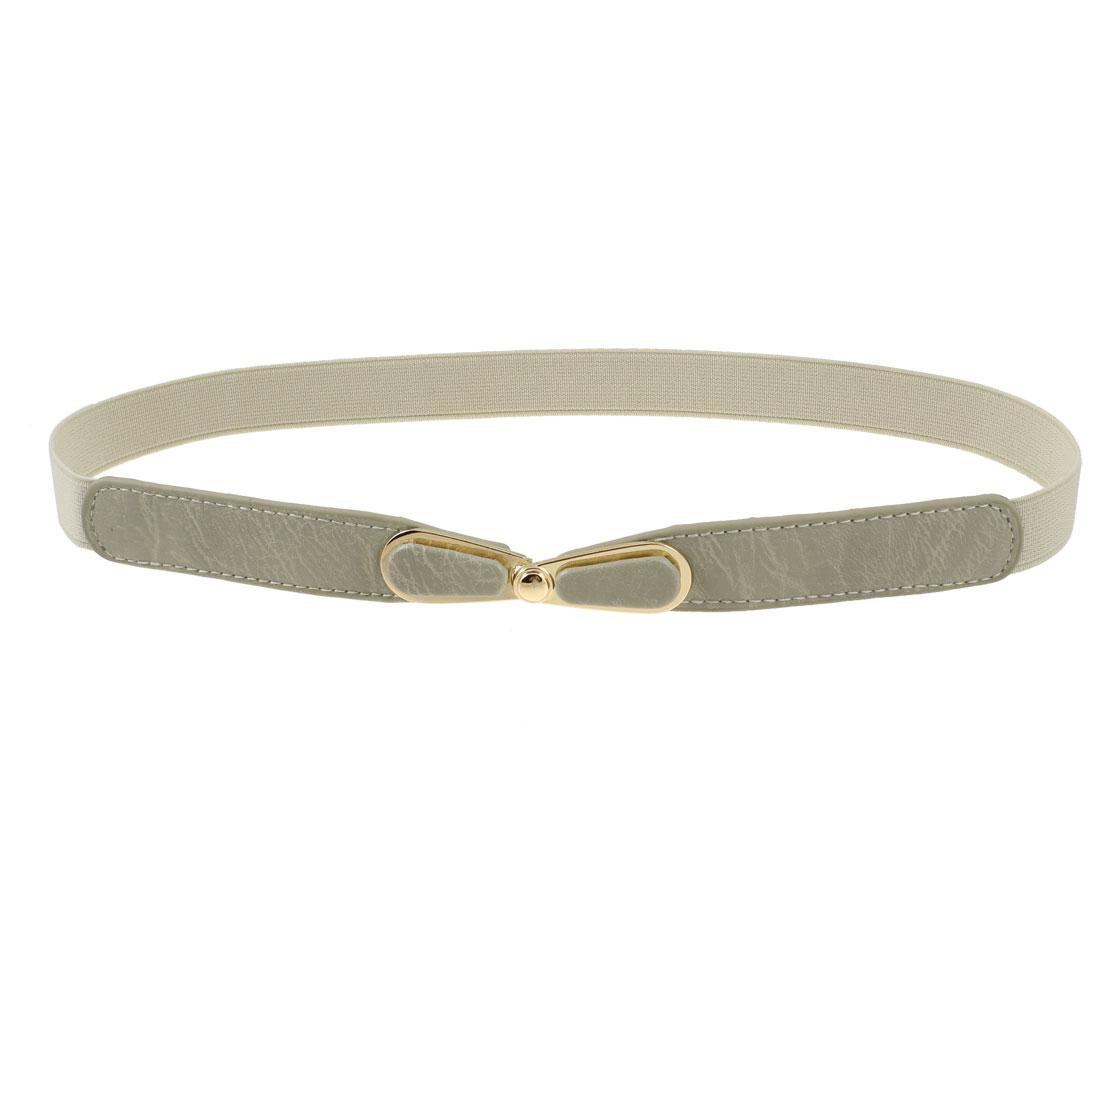 Faux Leather Interlock Buckle 8 Shape Elastic Waist Belt Khaki for Lady Girls